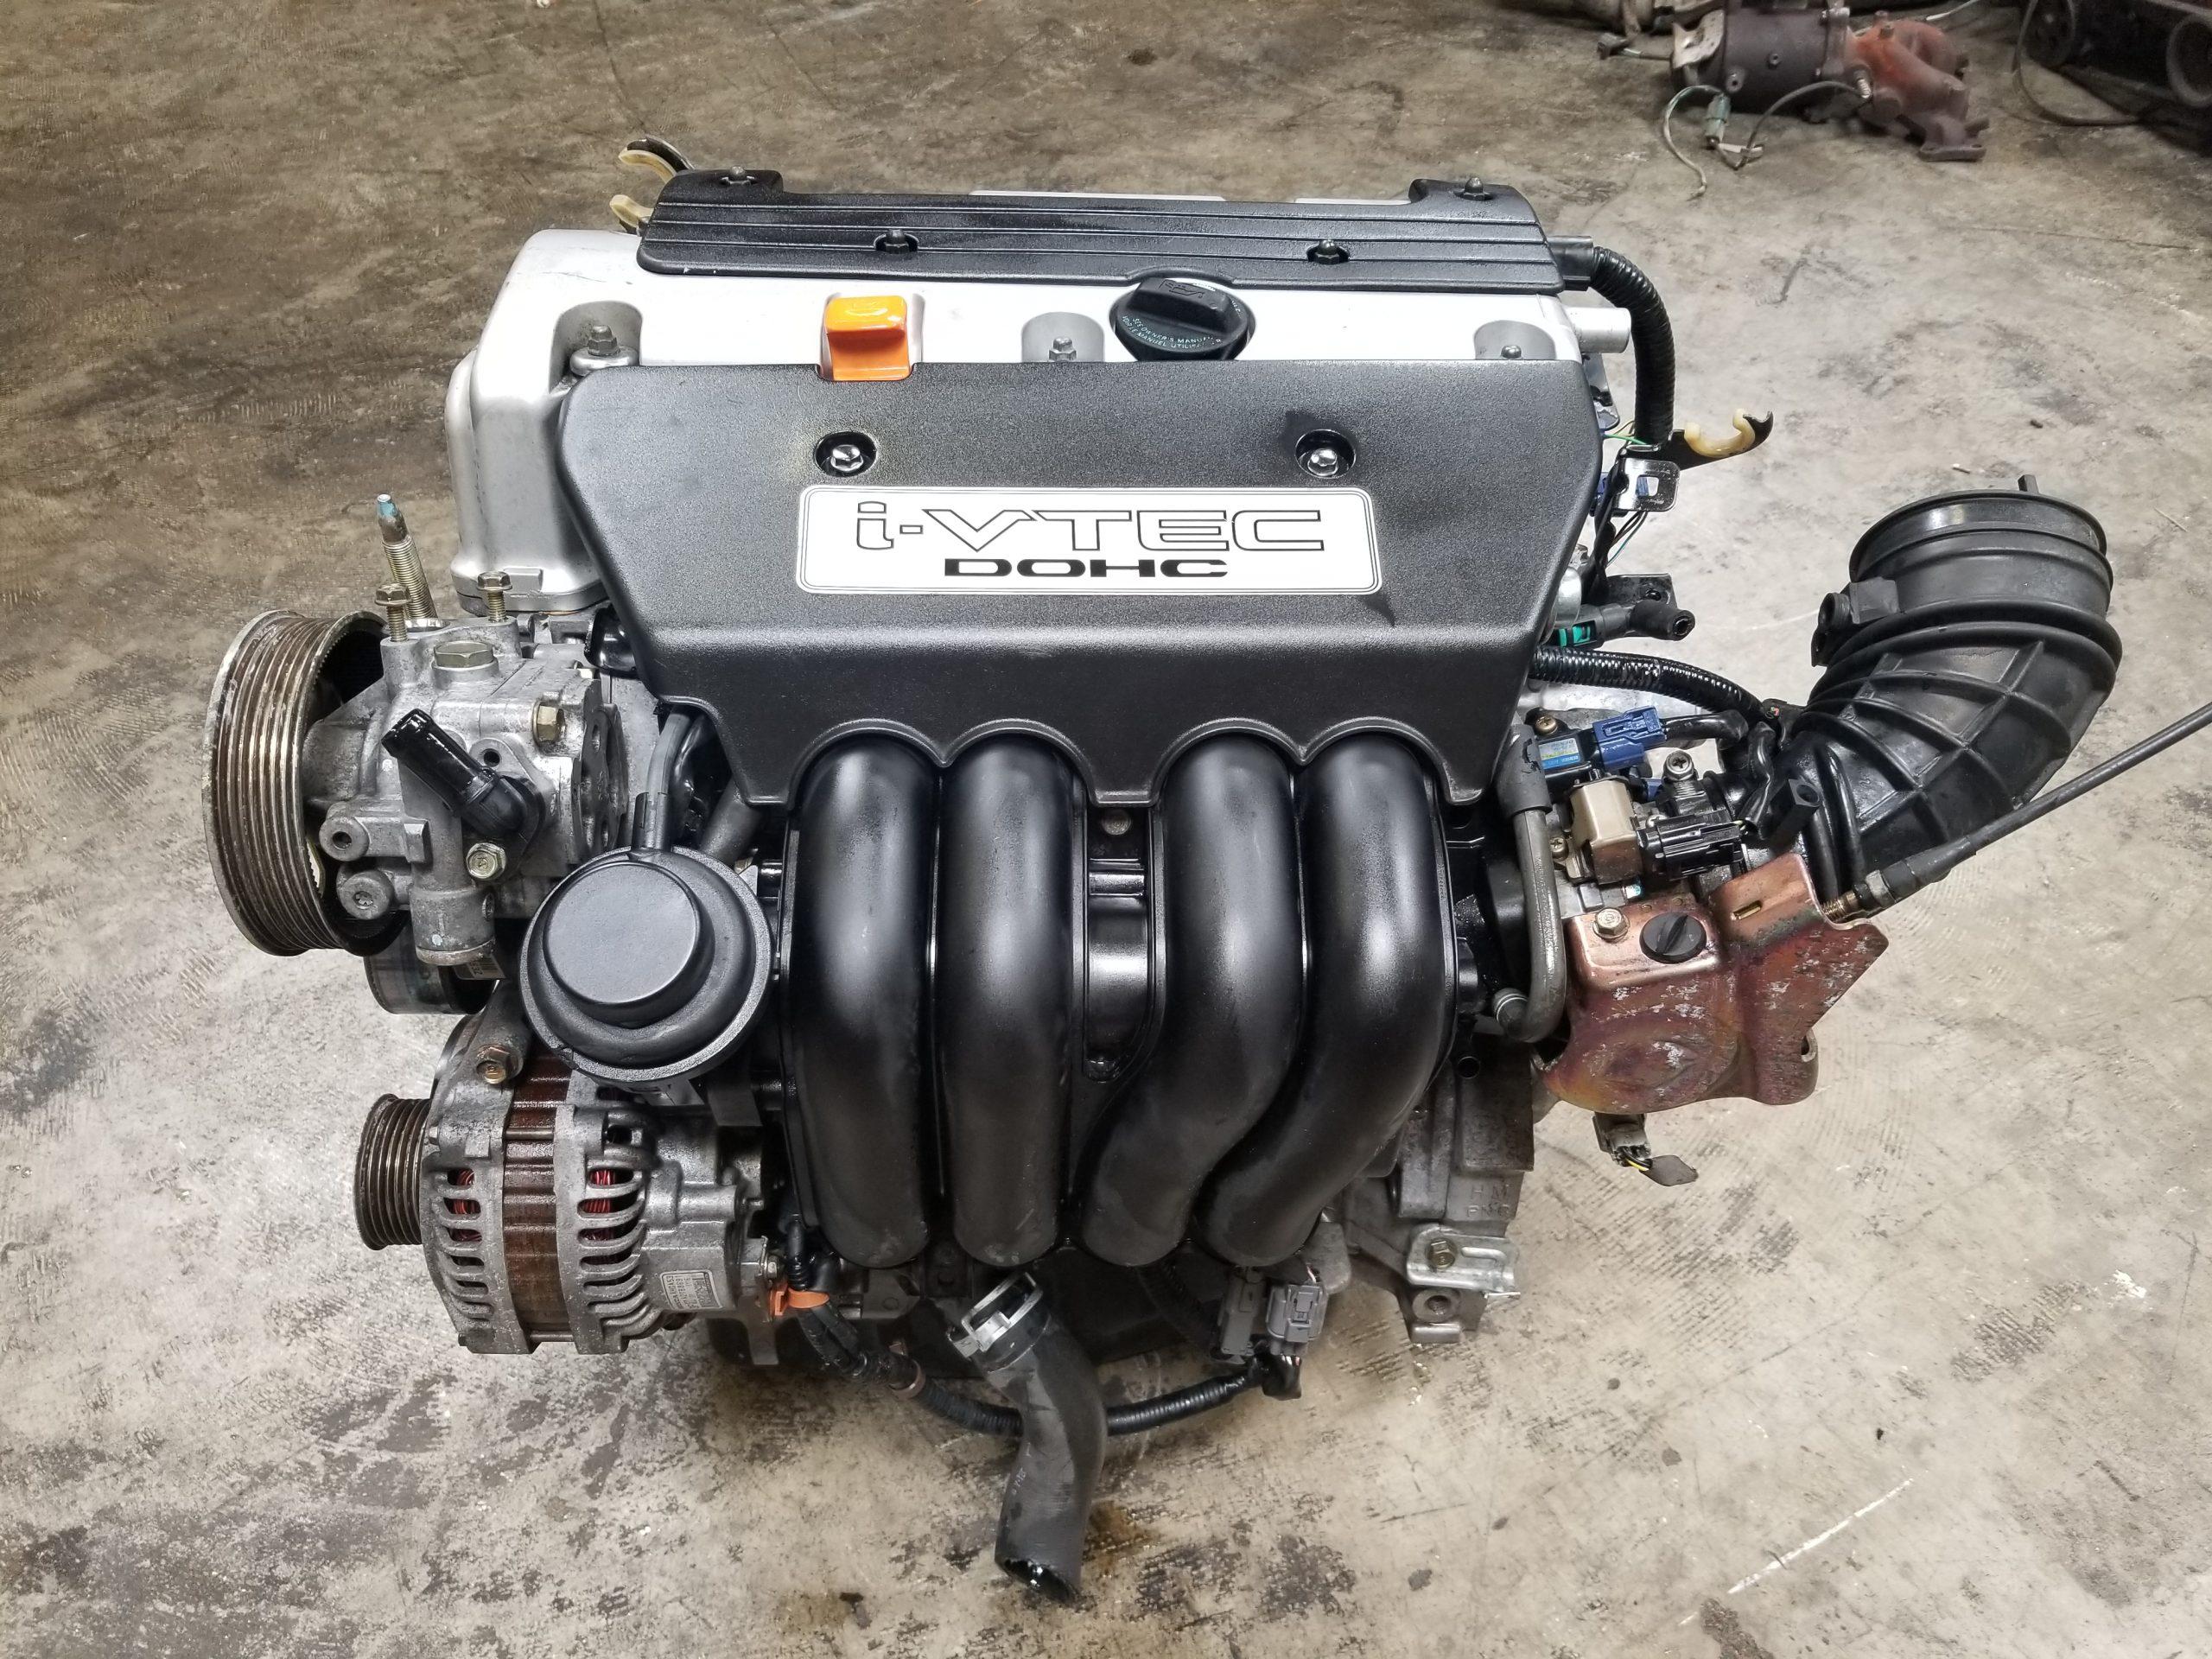 K20 2002 2006 Acura Rsx Base Civic Si 2 0 Engine Jdm K20a K20 K20a3 Jdm Of San Diego